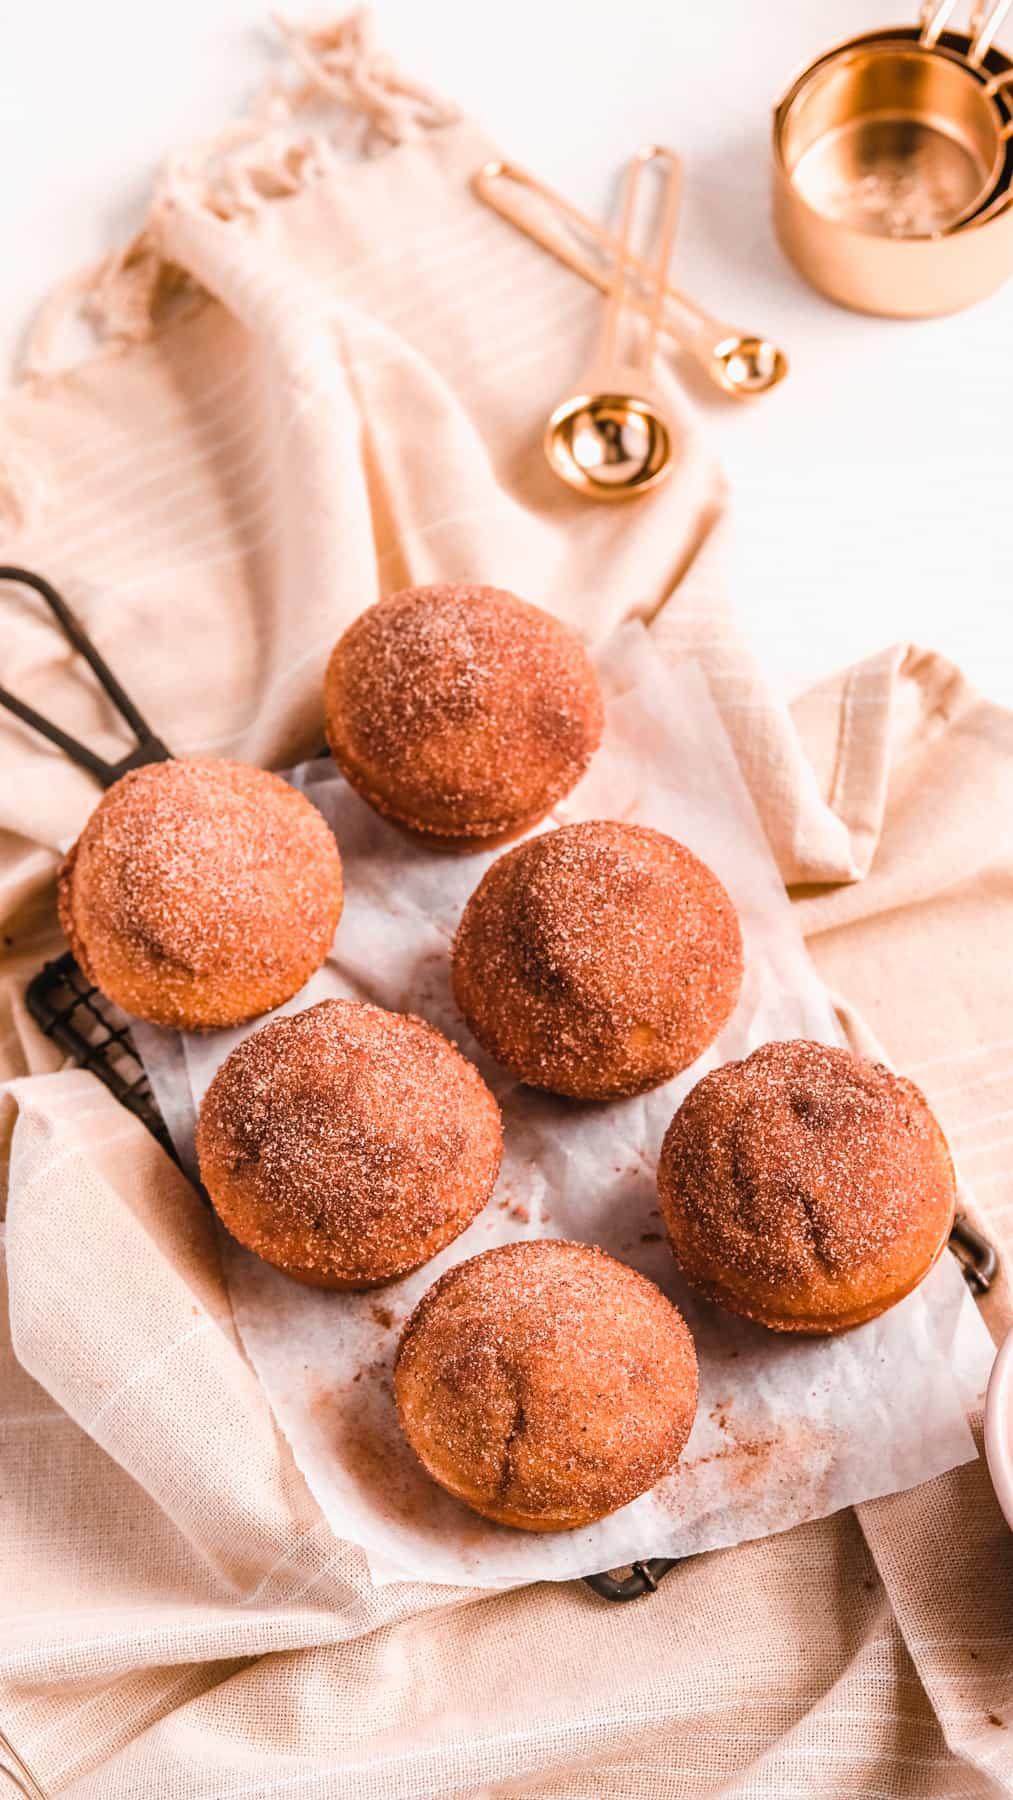 Cinnamon Donut Muffins on a wire rack with baking utensils around them